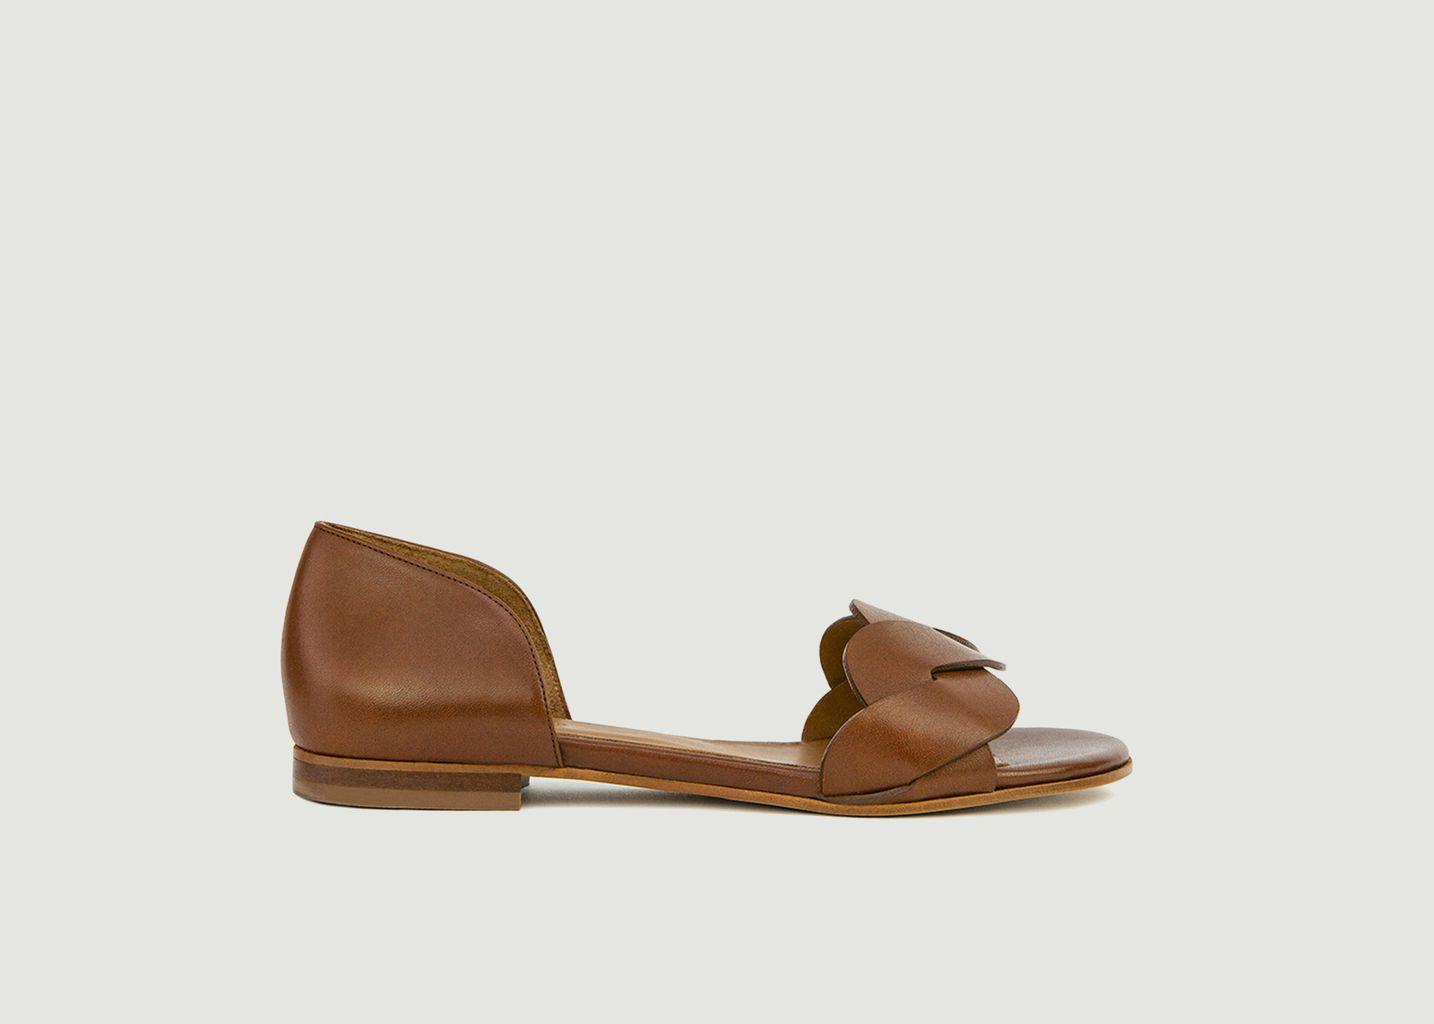 Sandales plates en cuir N°36 - Rivecour